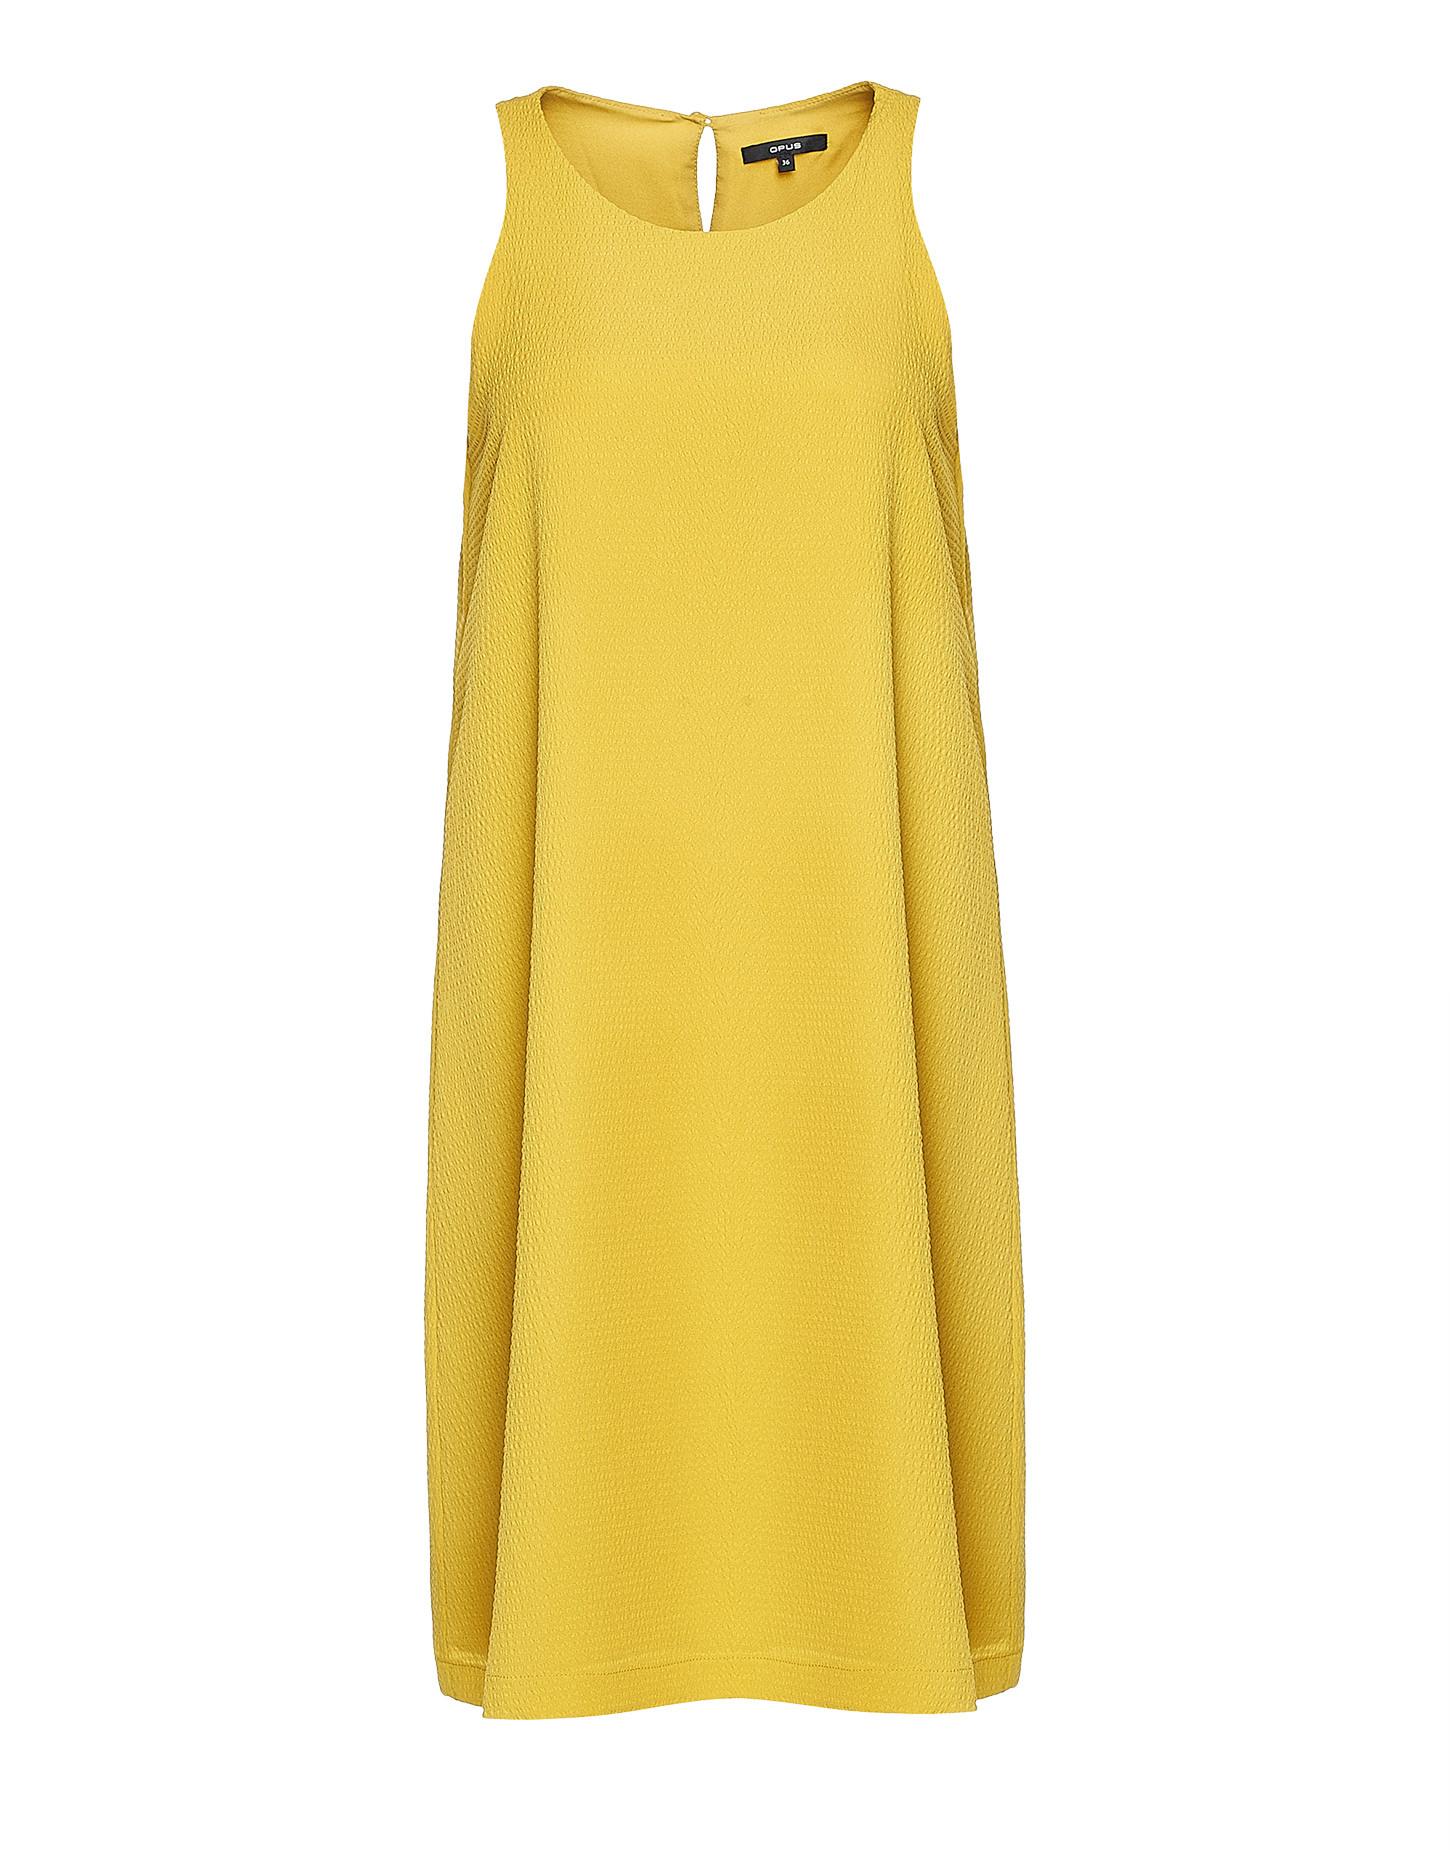 Sommerkleid Weria St Gelb Online Bestellen  Opus Online Shop